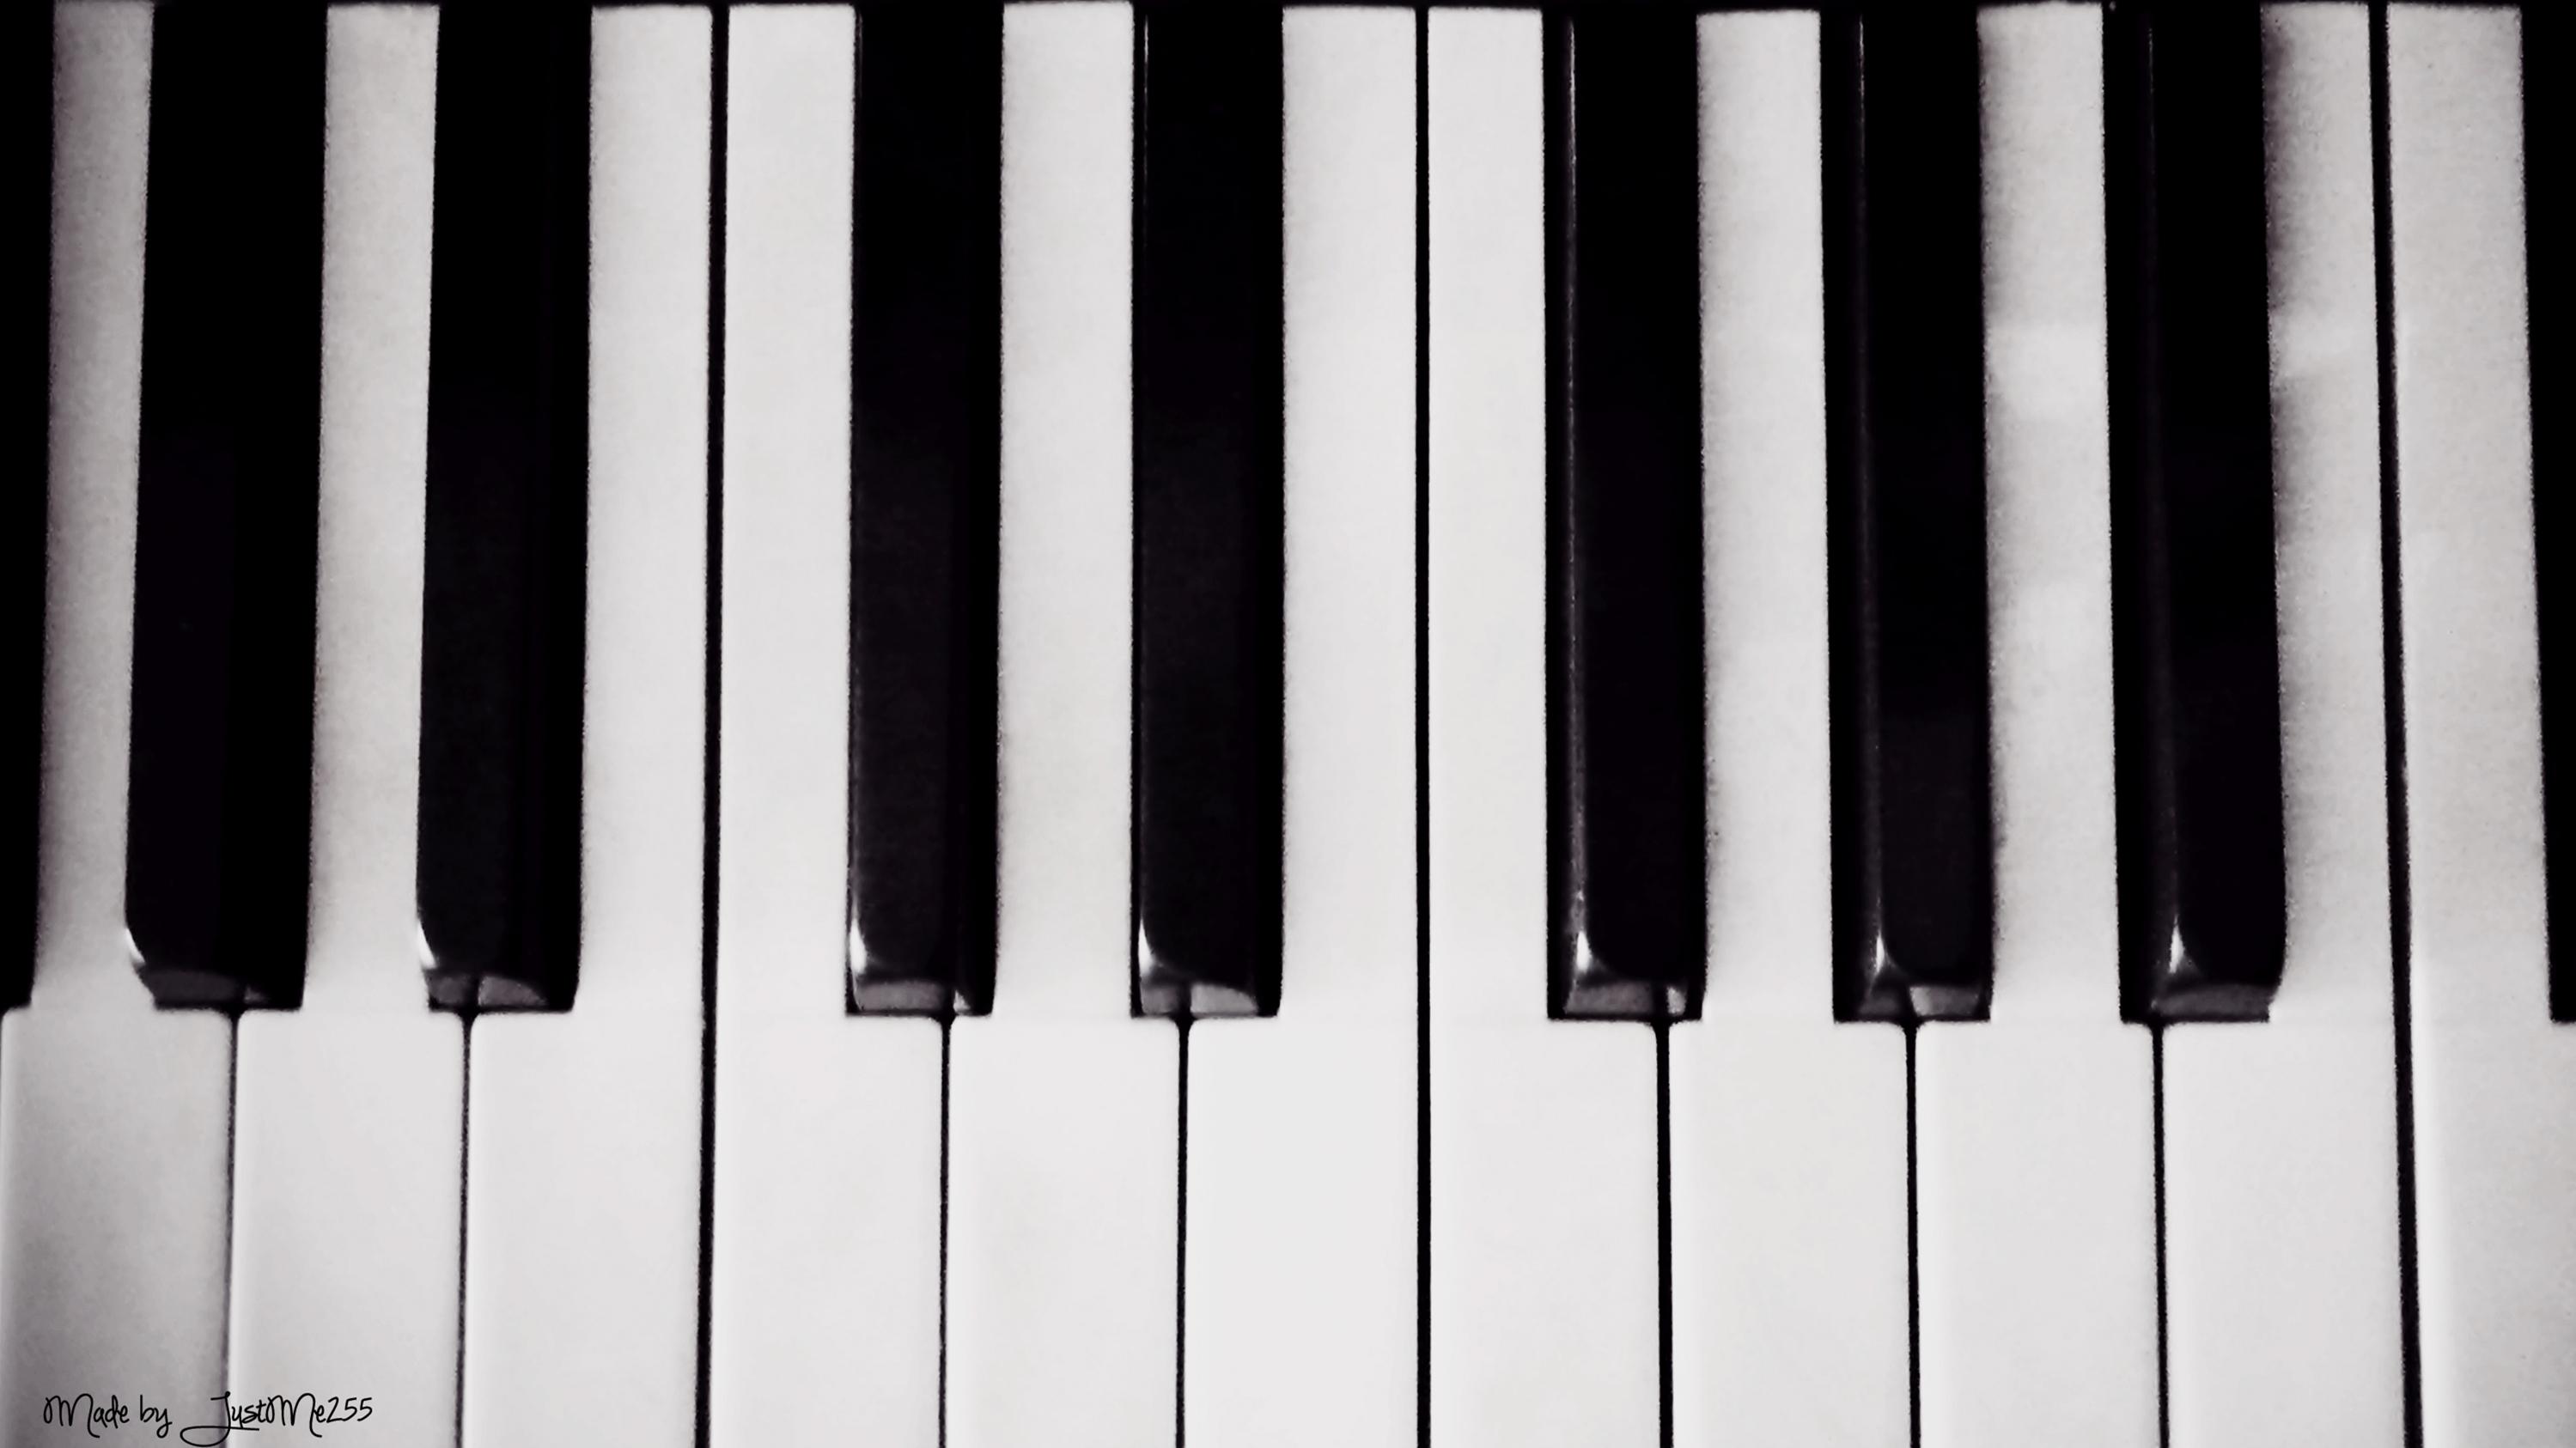 Piano Wallpaper By Iulia Oprinesc On Deviantart